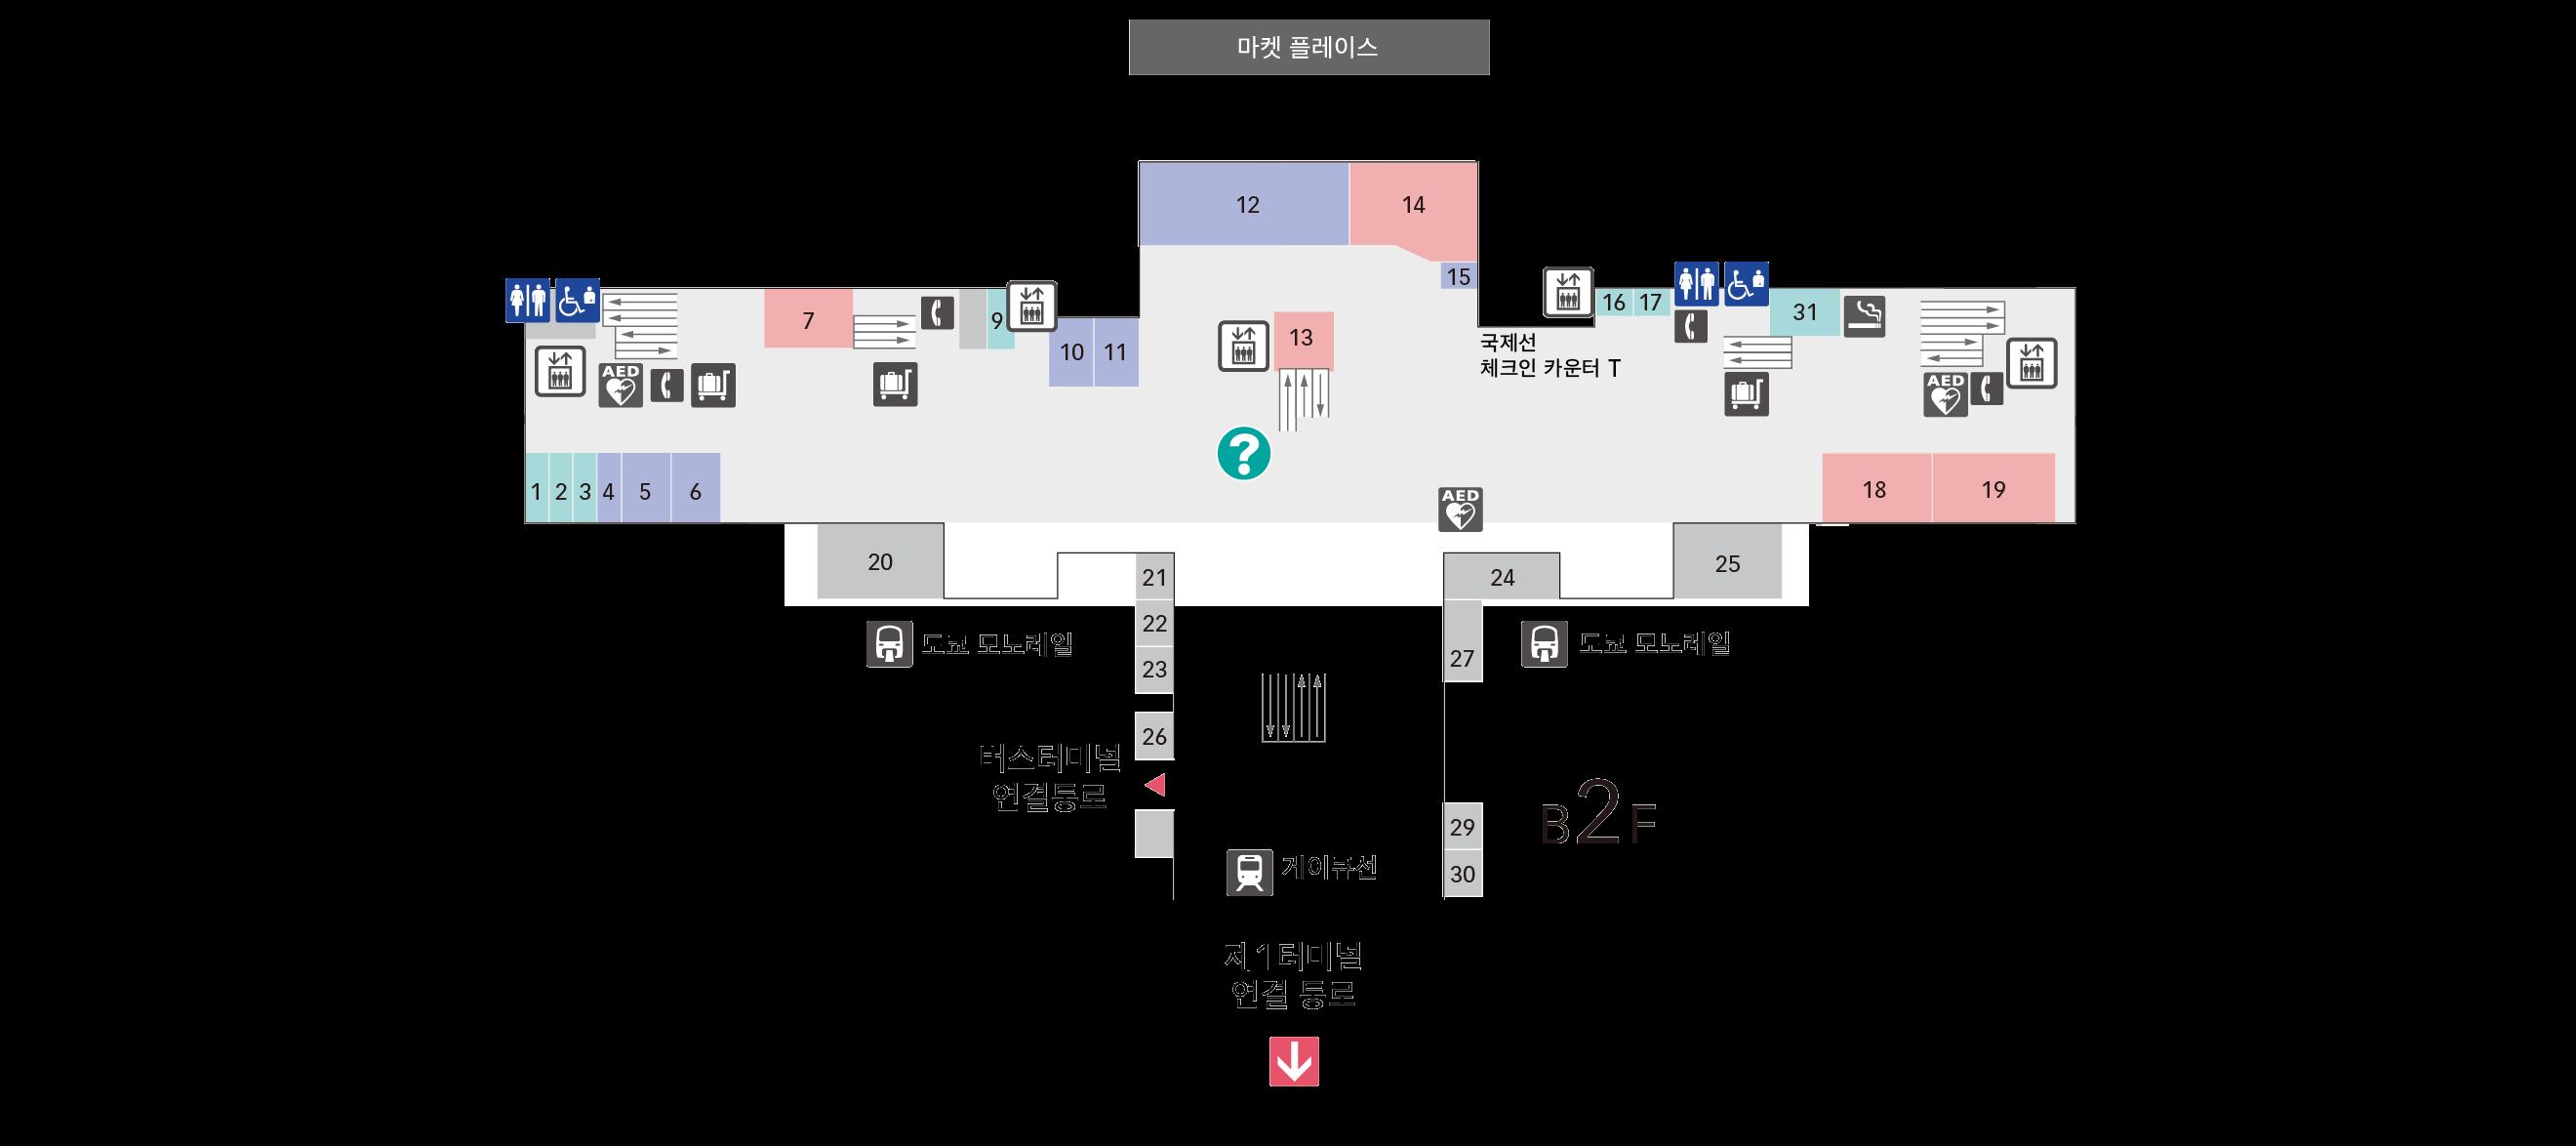 B1F 게이큐선· 도쿄 모노레일 플로어 맵